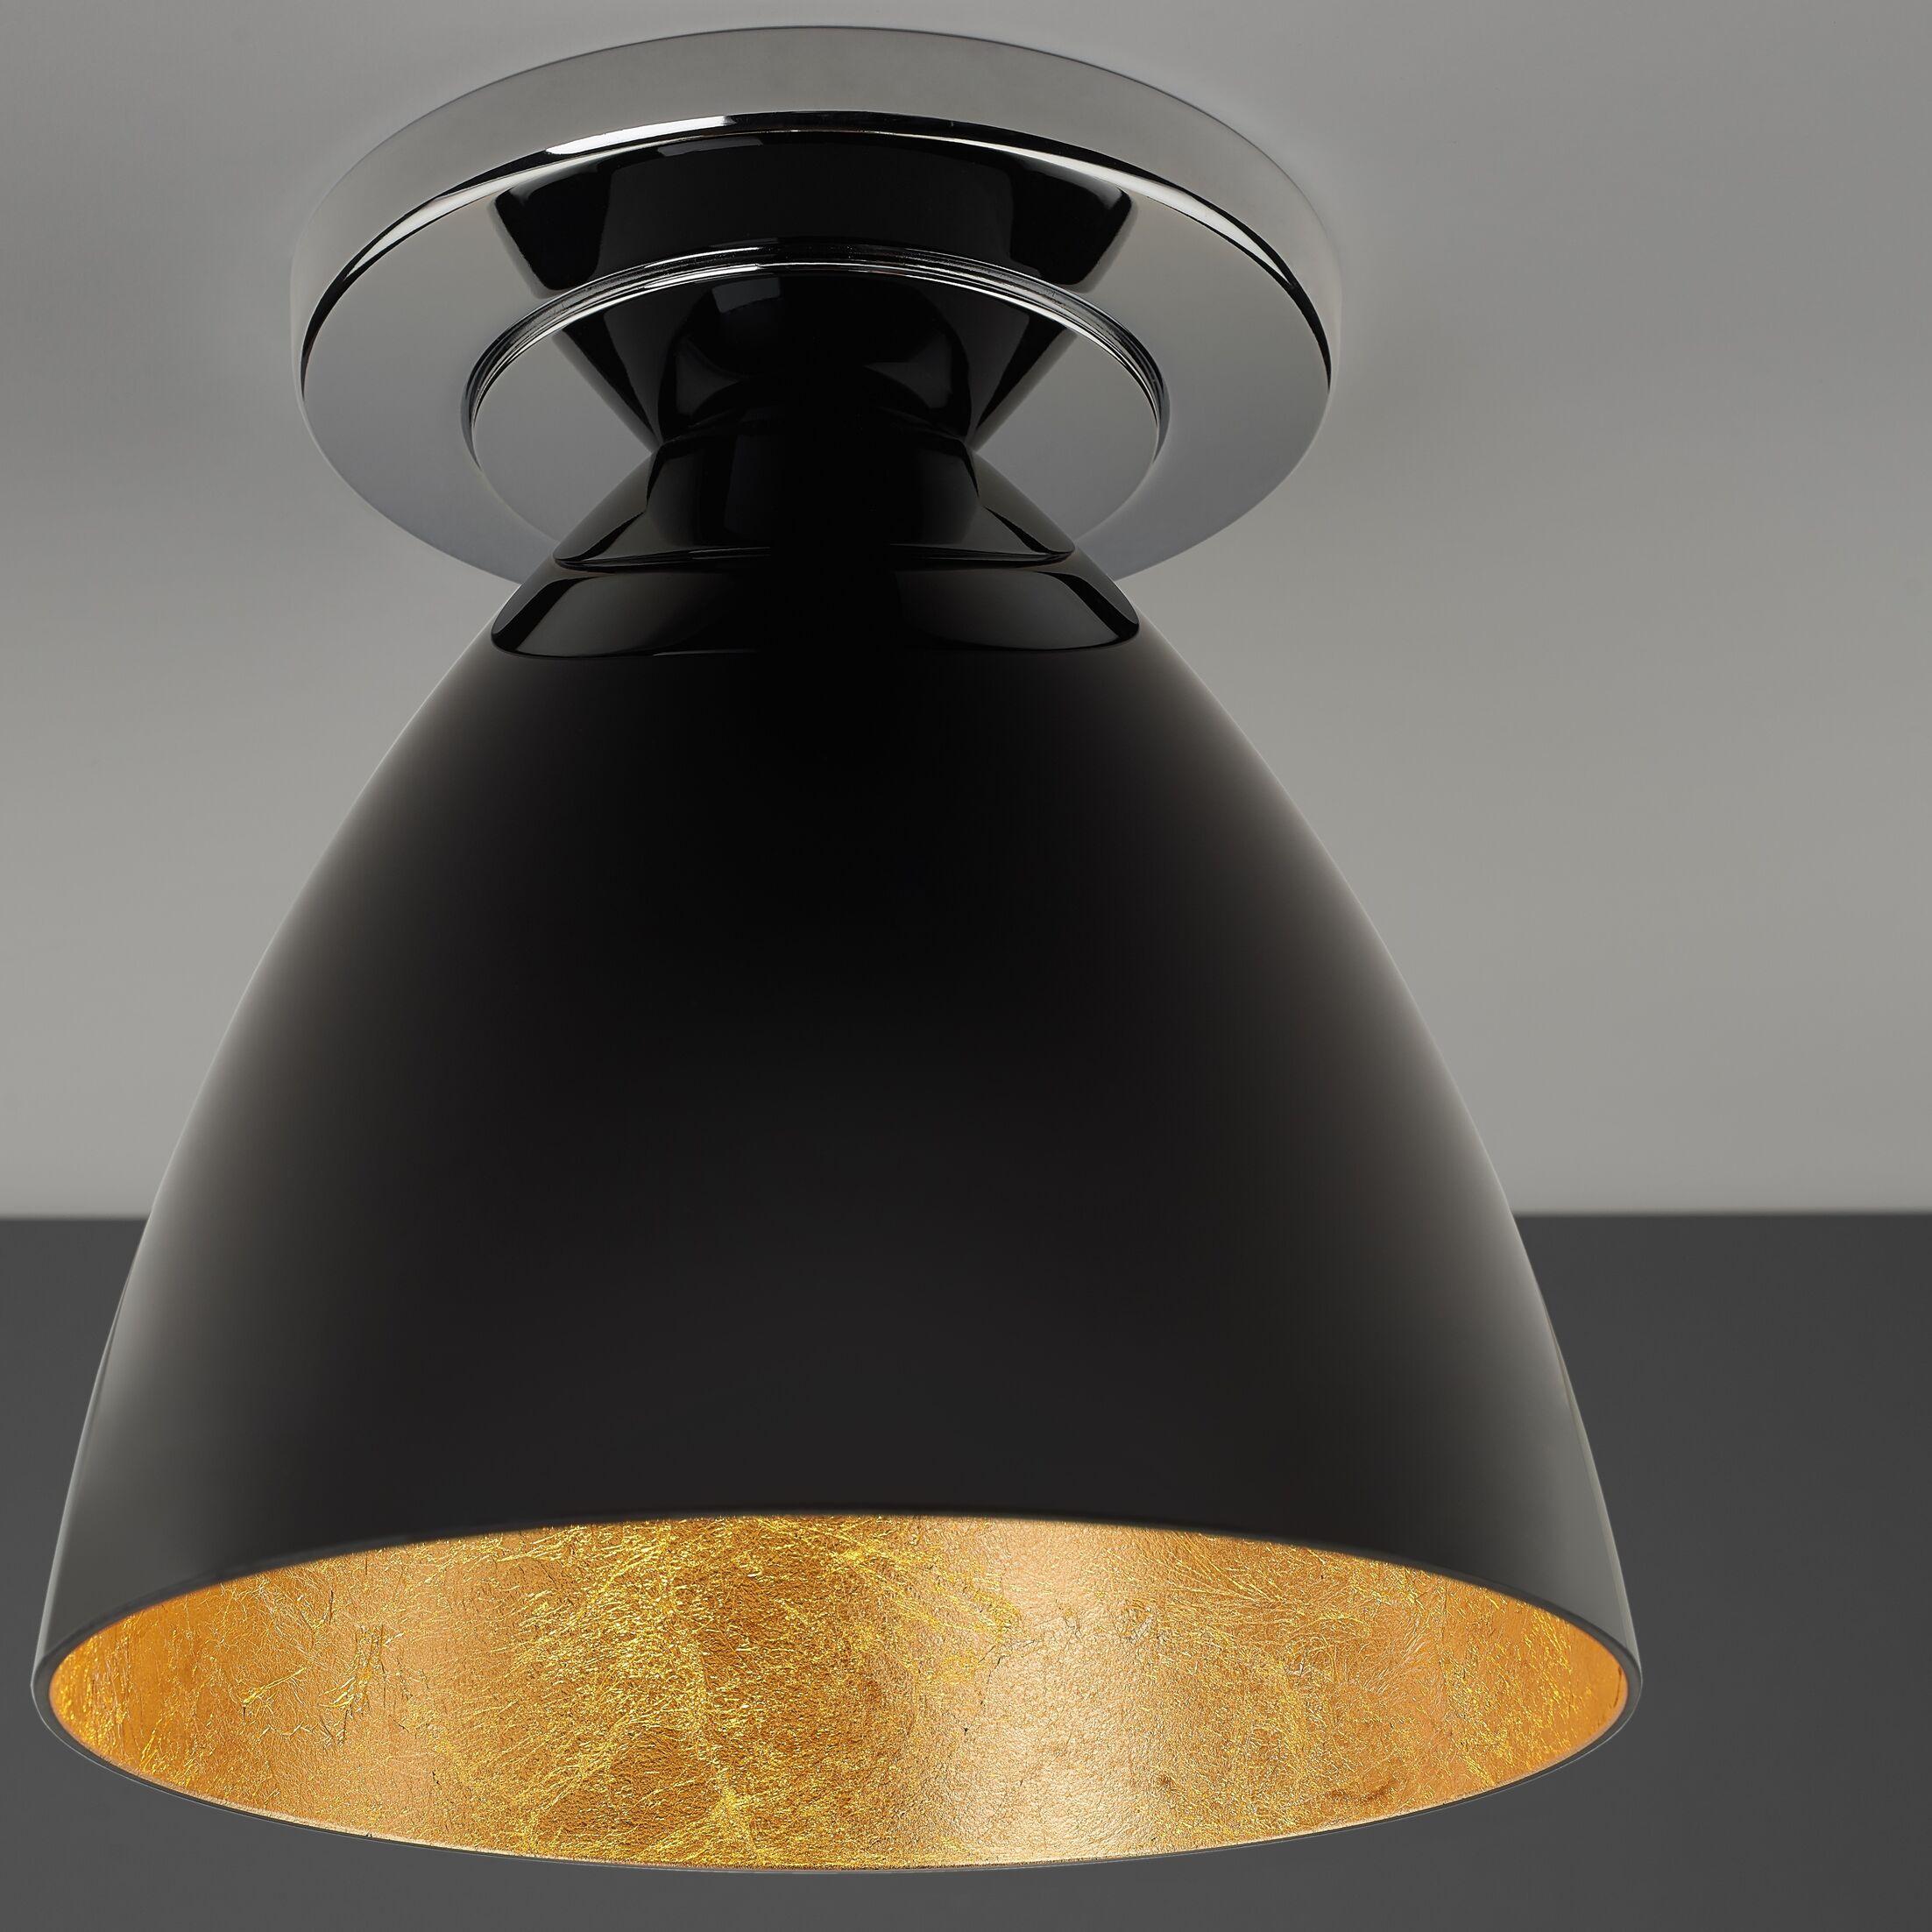 Cleo 1-Light Flush Mount Color: Chrome, Interior Shade Color: Gold